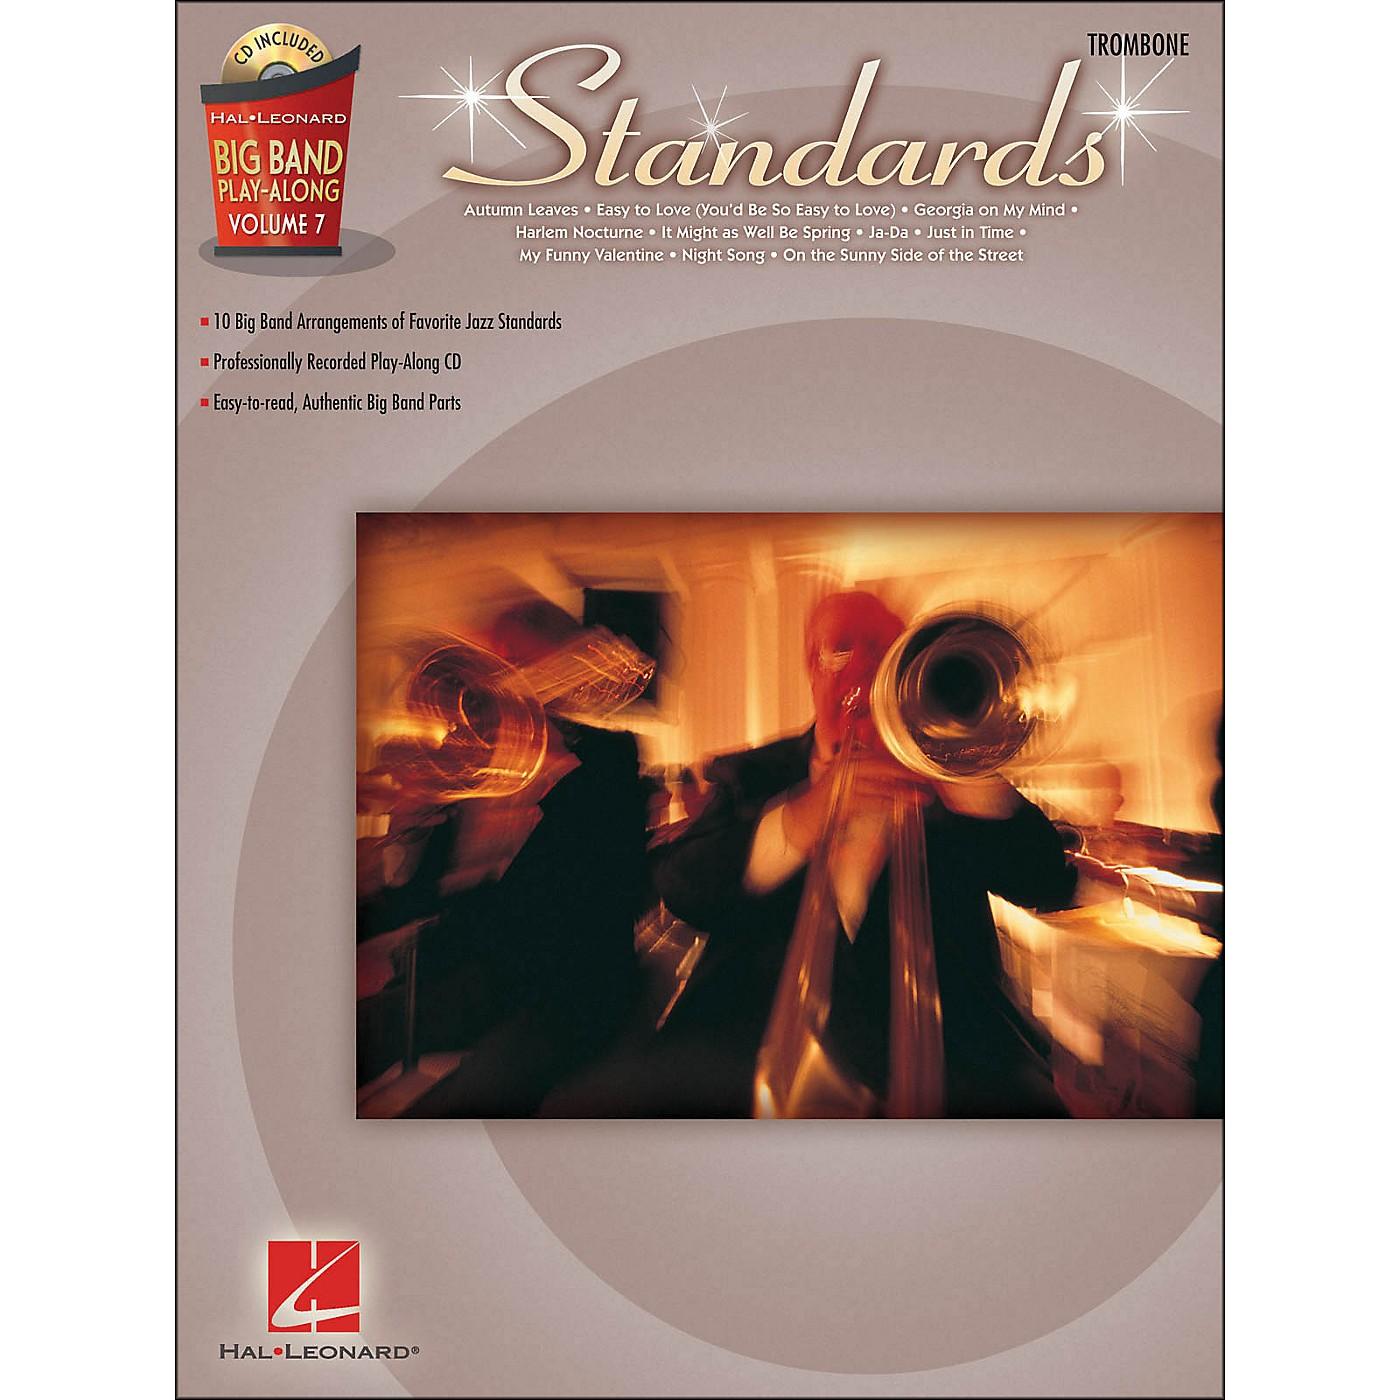 Hal Leonard Standards - Big Band Play-Along Vol. 7 Trombone thumbnail